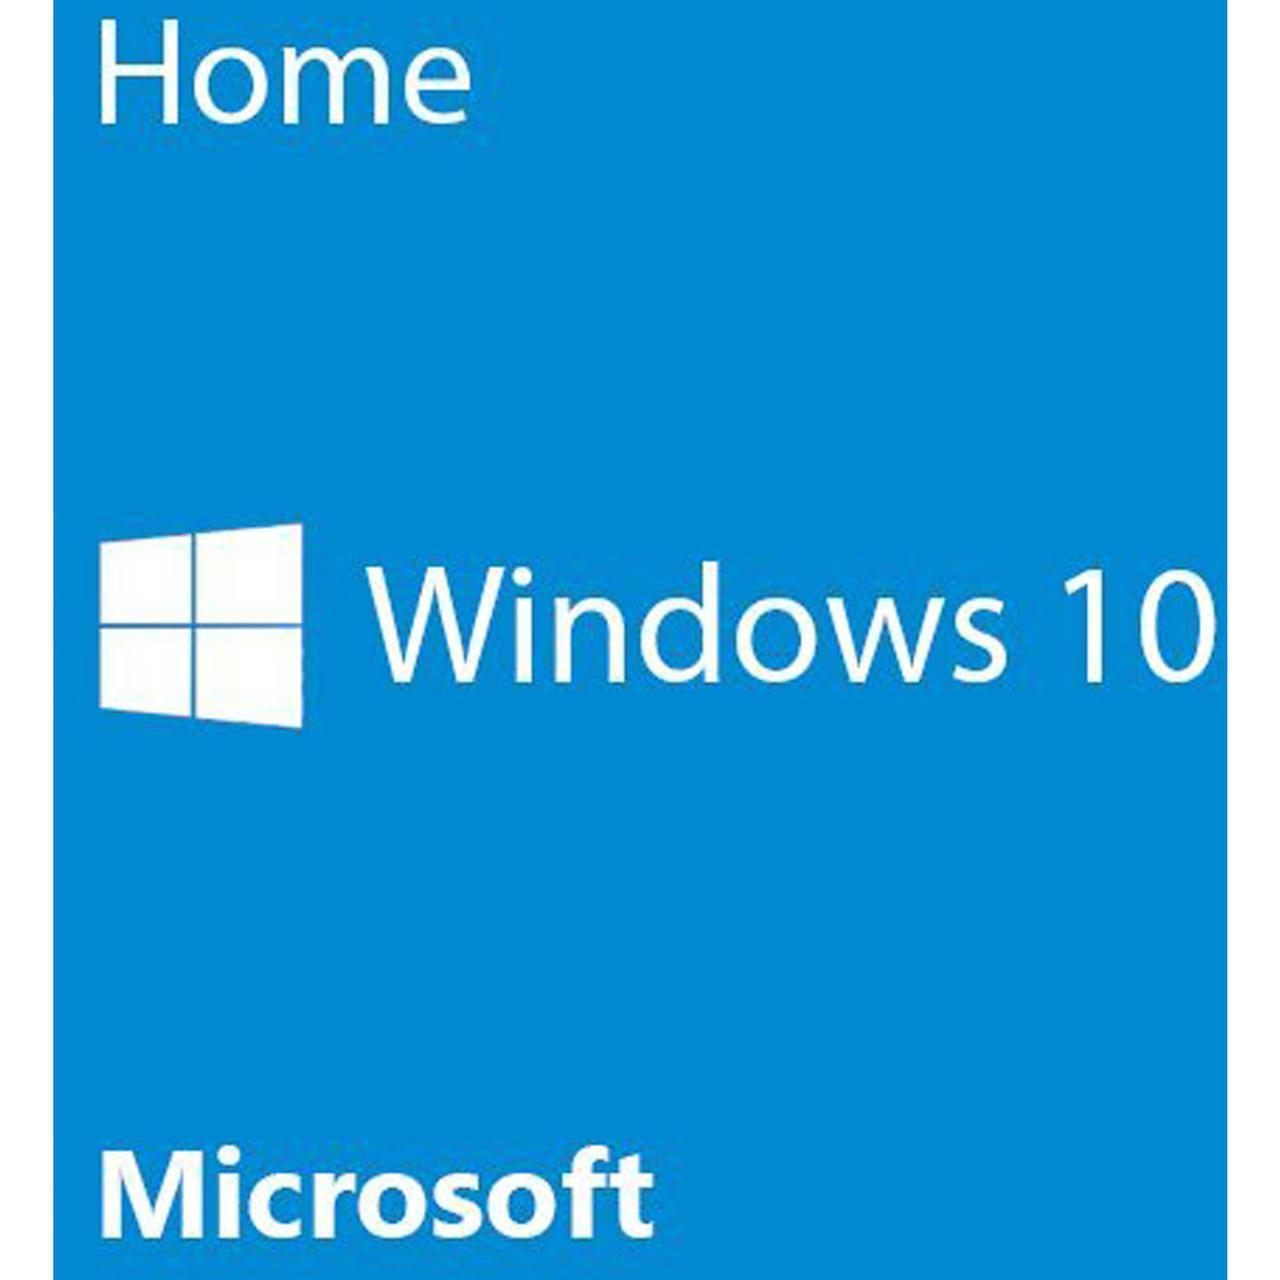 Операционная система Microsoft Windows Home 10 64Bit KW9-00118 (OEI, OEM)